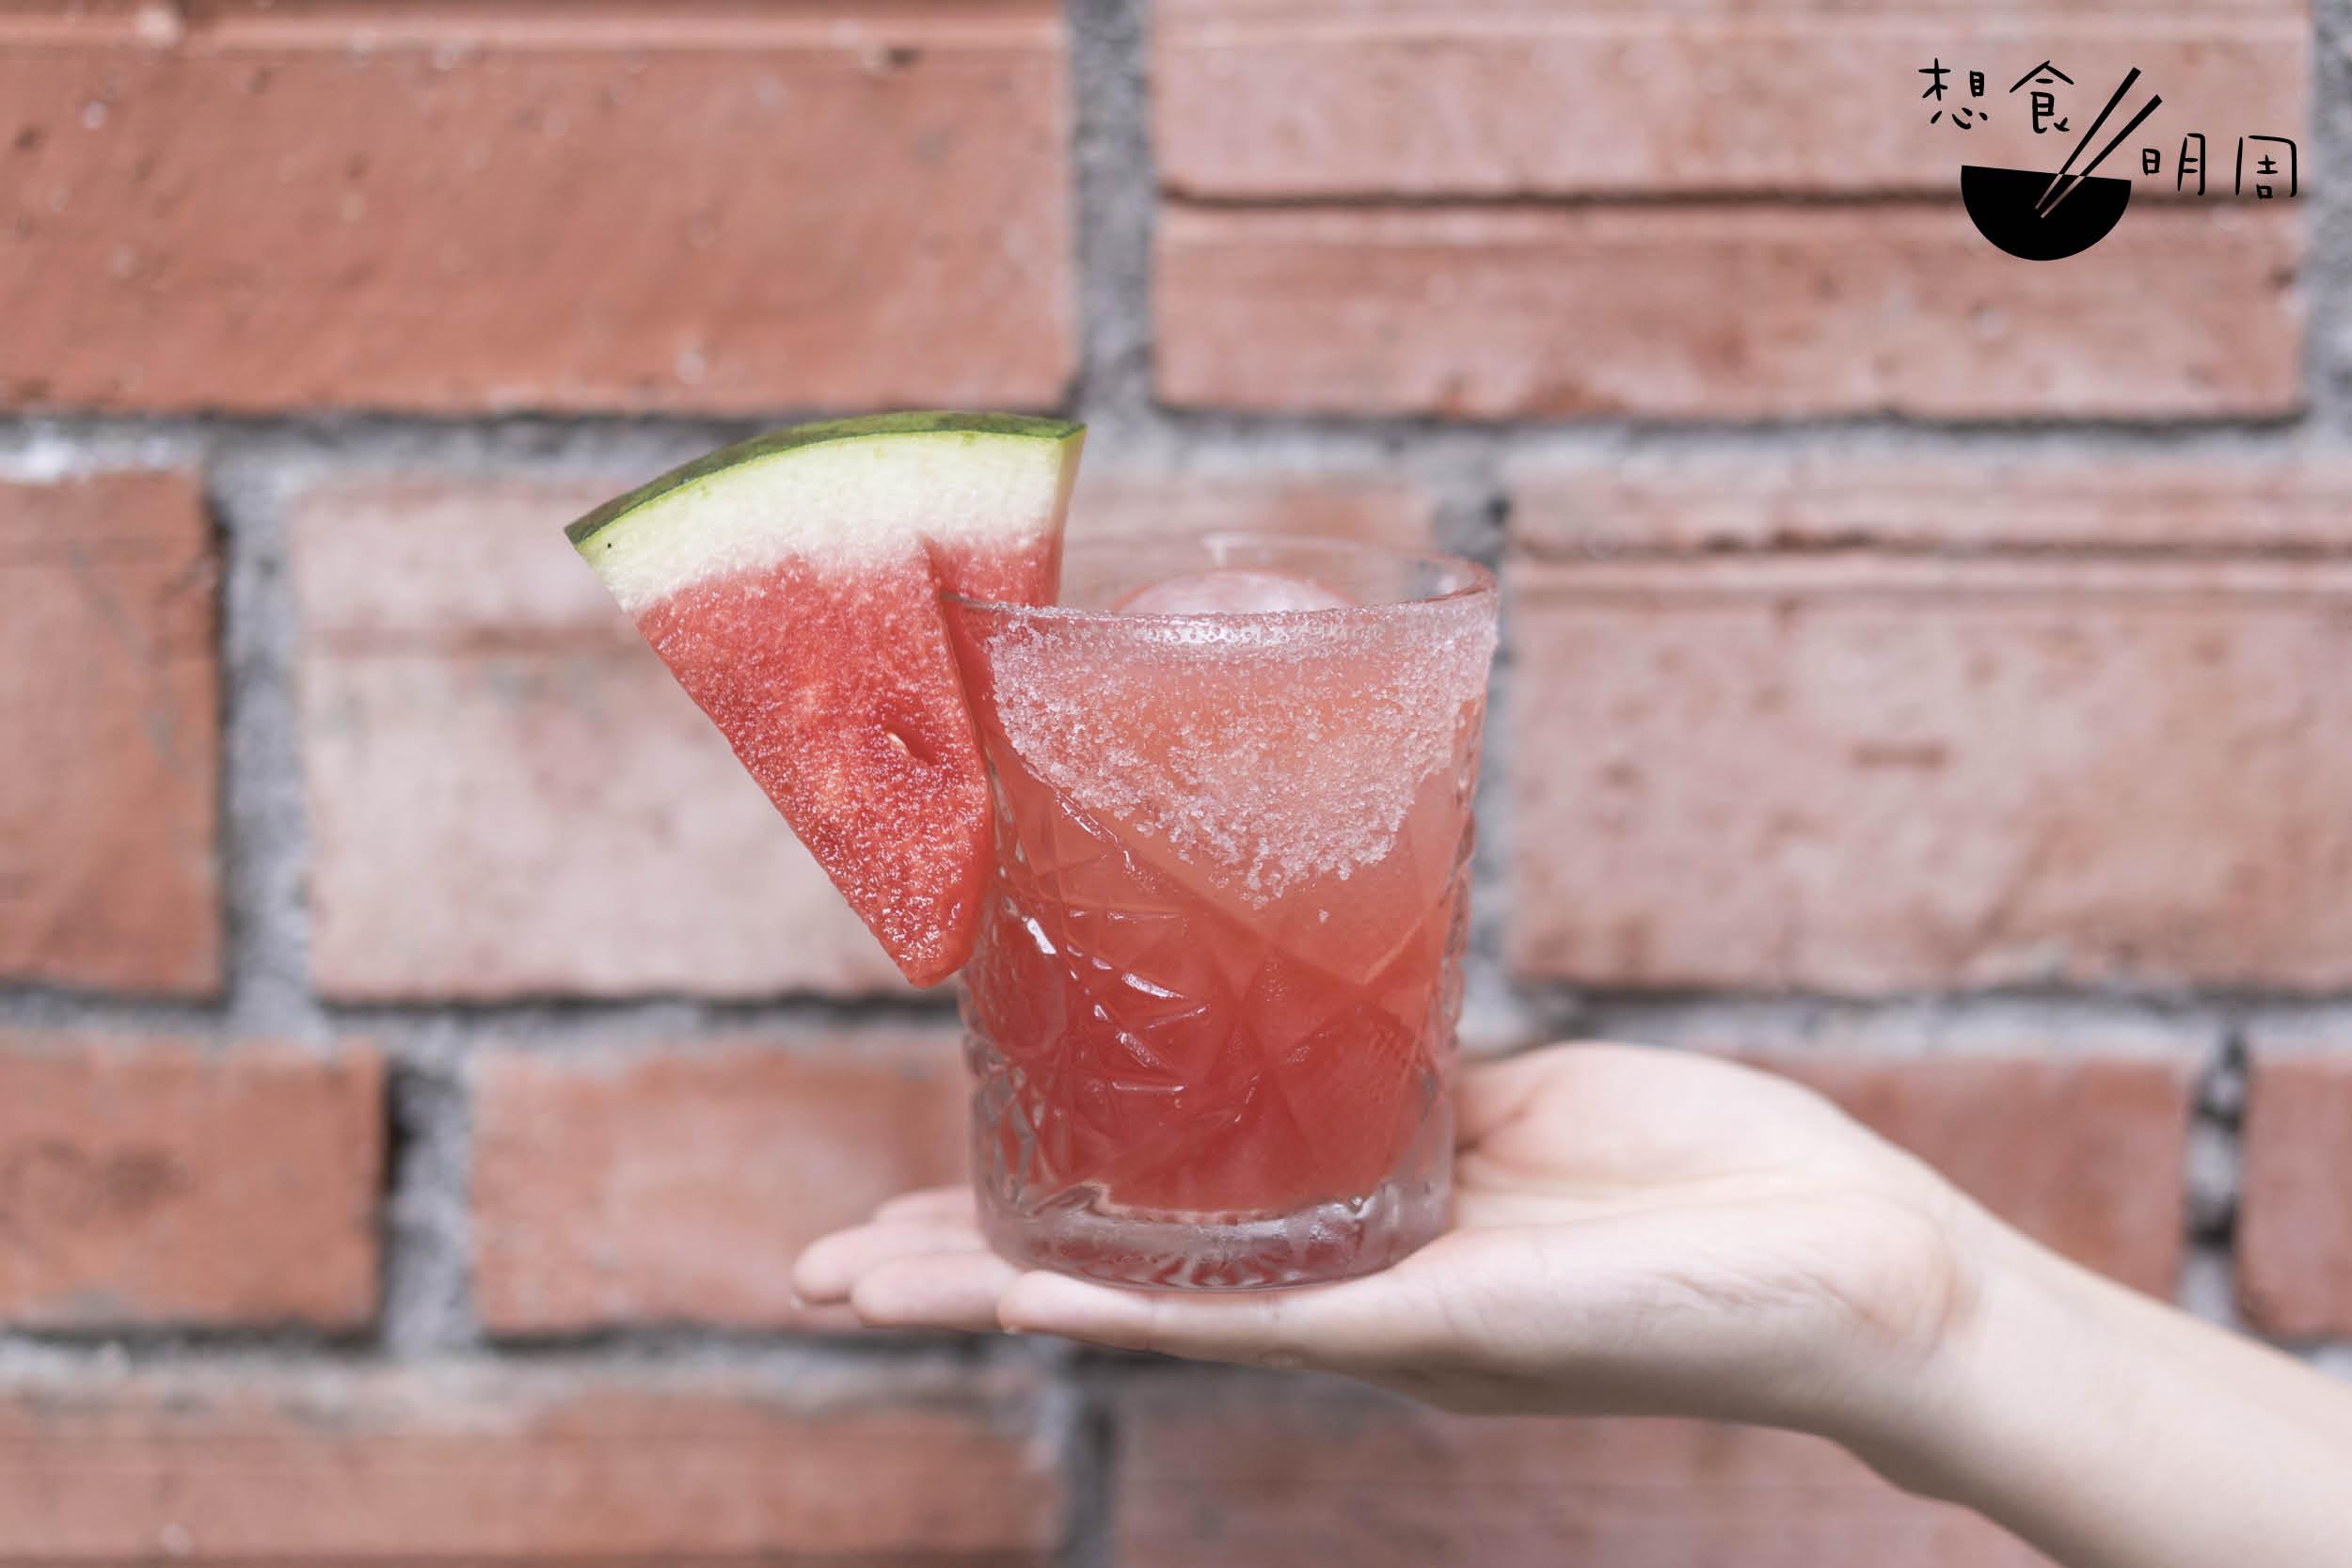 Sandia // 烈日當空或悶熱焗雨,都令人汗流浹背。一杯有新鮮西瓜的西瓜調酒,是安坐下後不用細想立即柯打的調酒。($98)